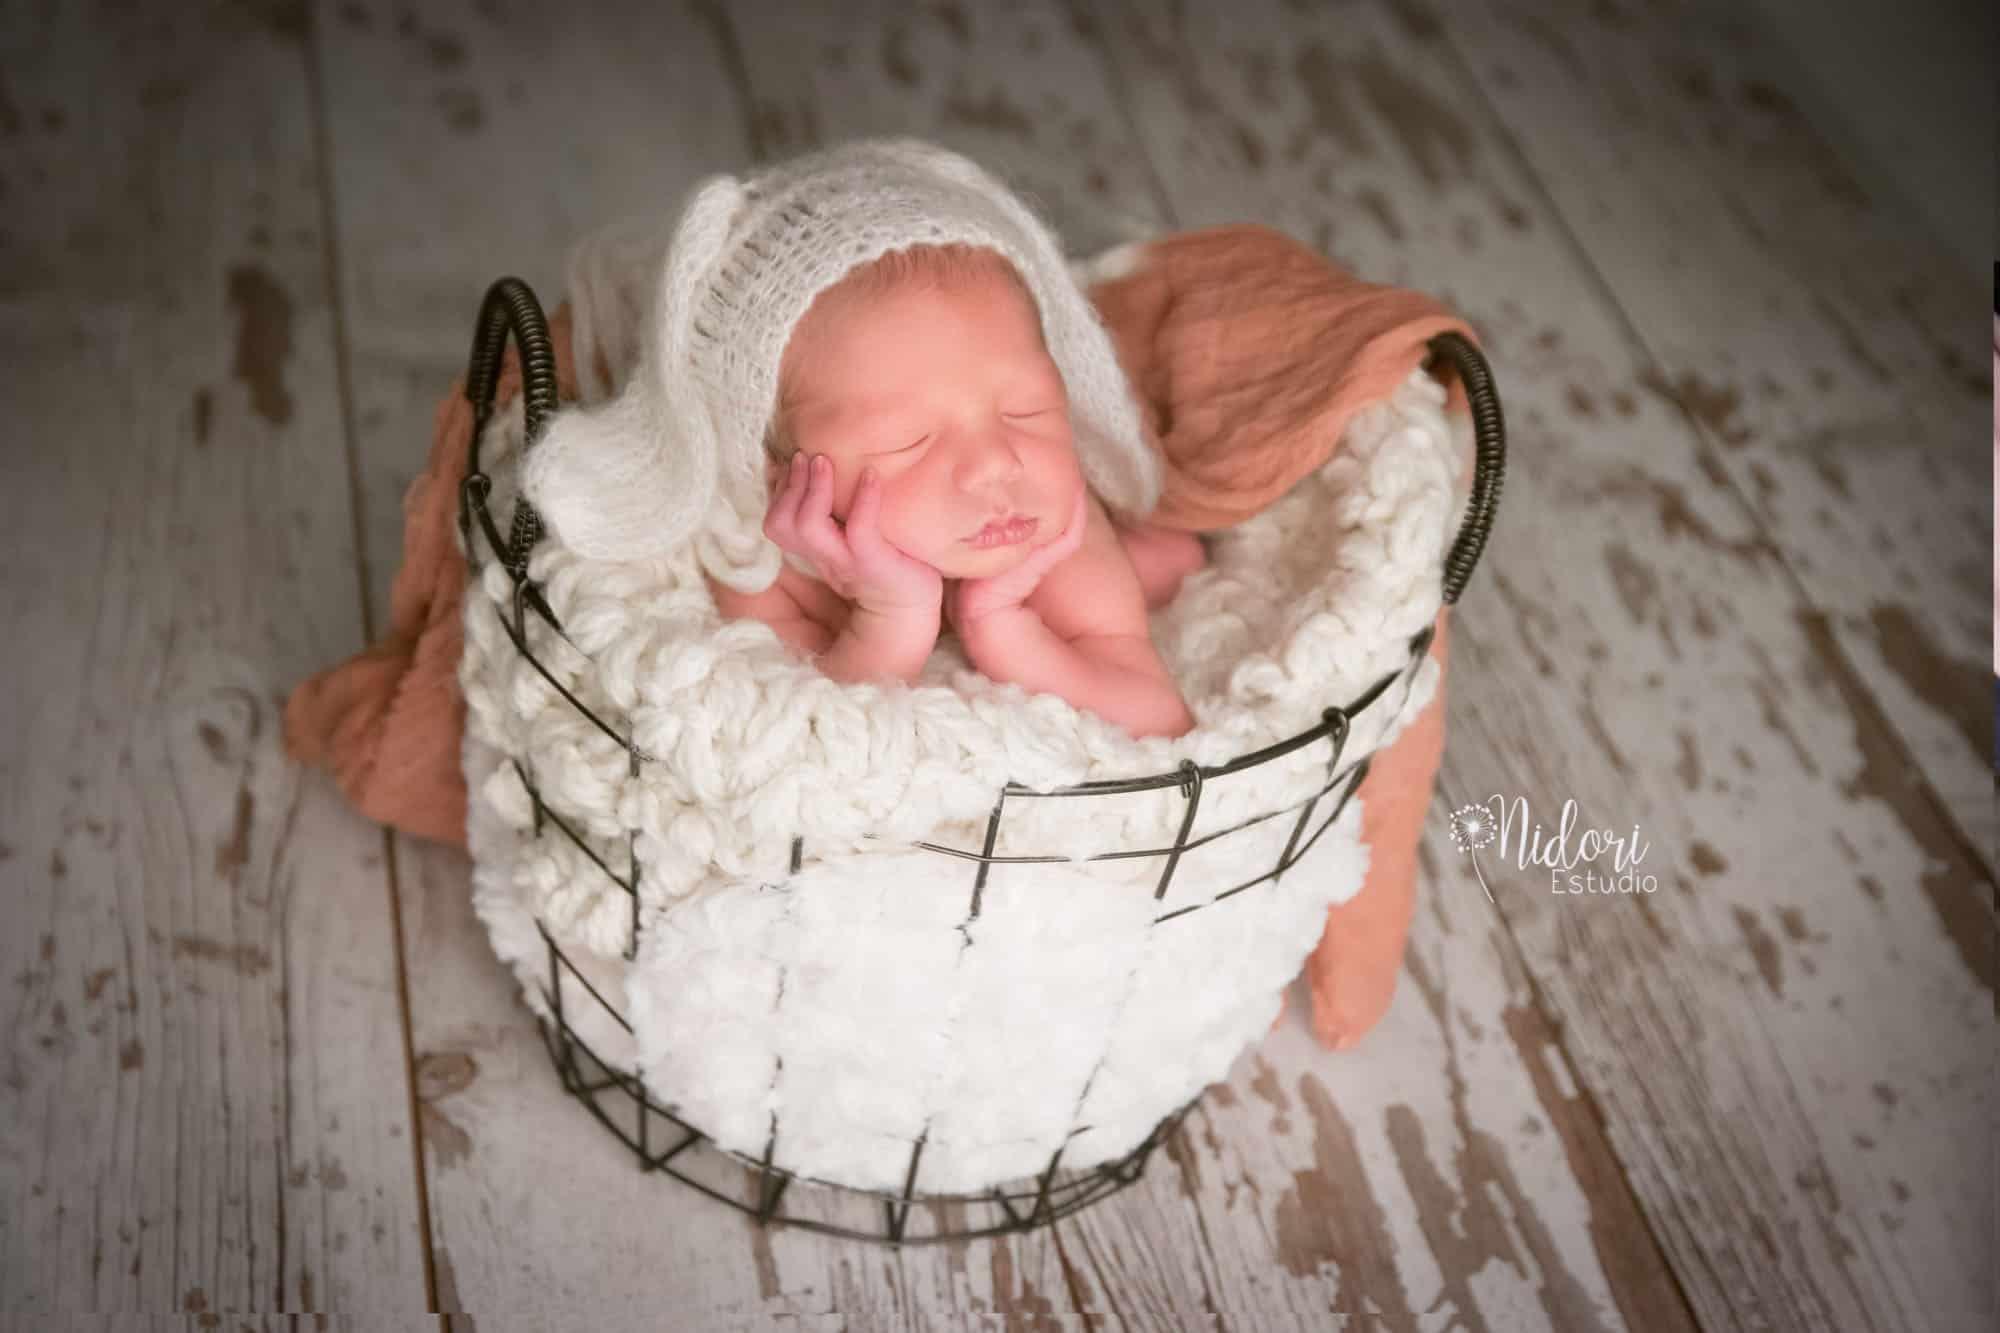 fotosbebe-fotografia-recien-nacido-newborn-bebes-nidoriestudio-fotos-valencia-almazora-castellon-españa-spain-08